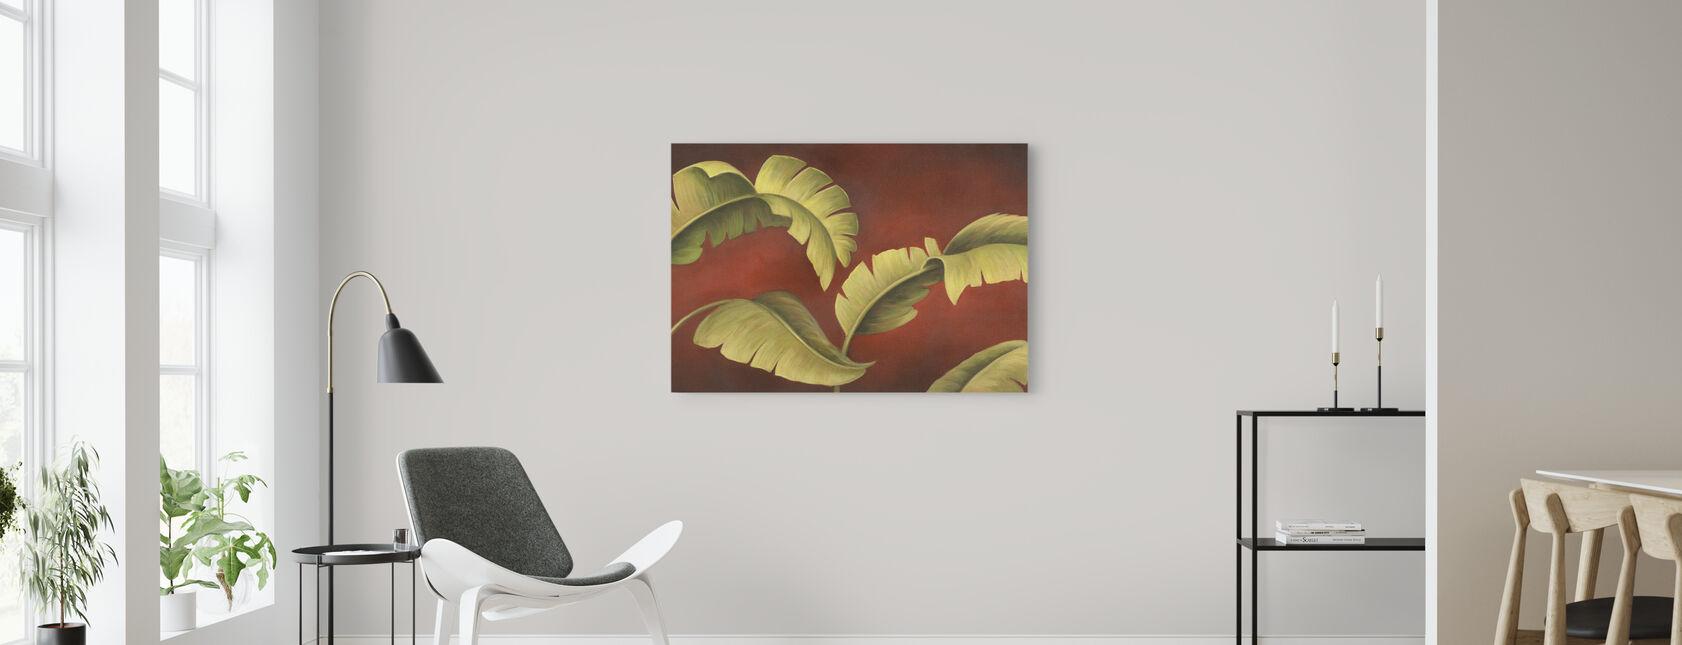 Palms On Burgundy - Canvas print - Living Room